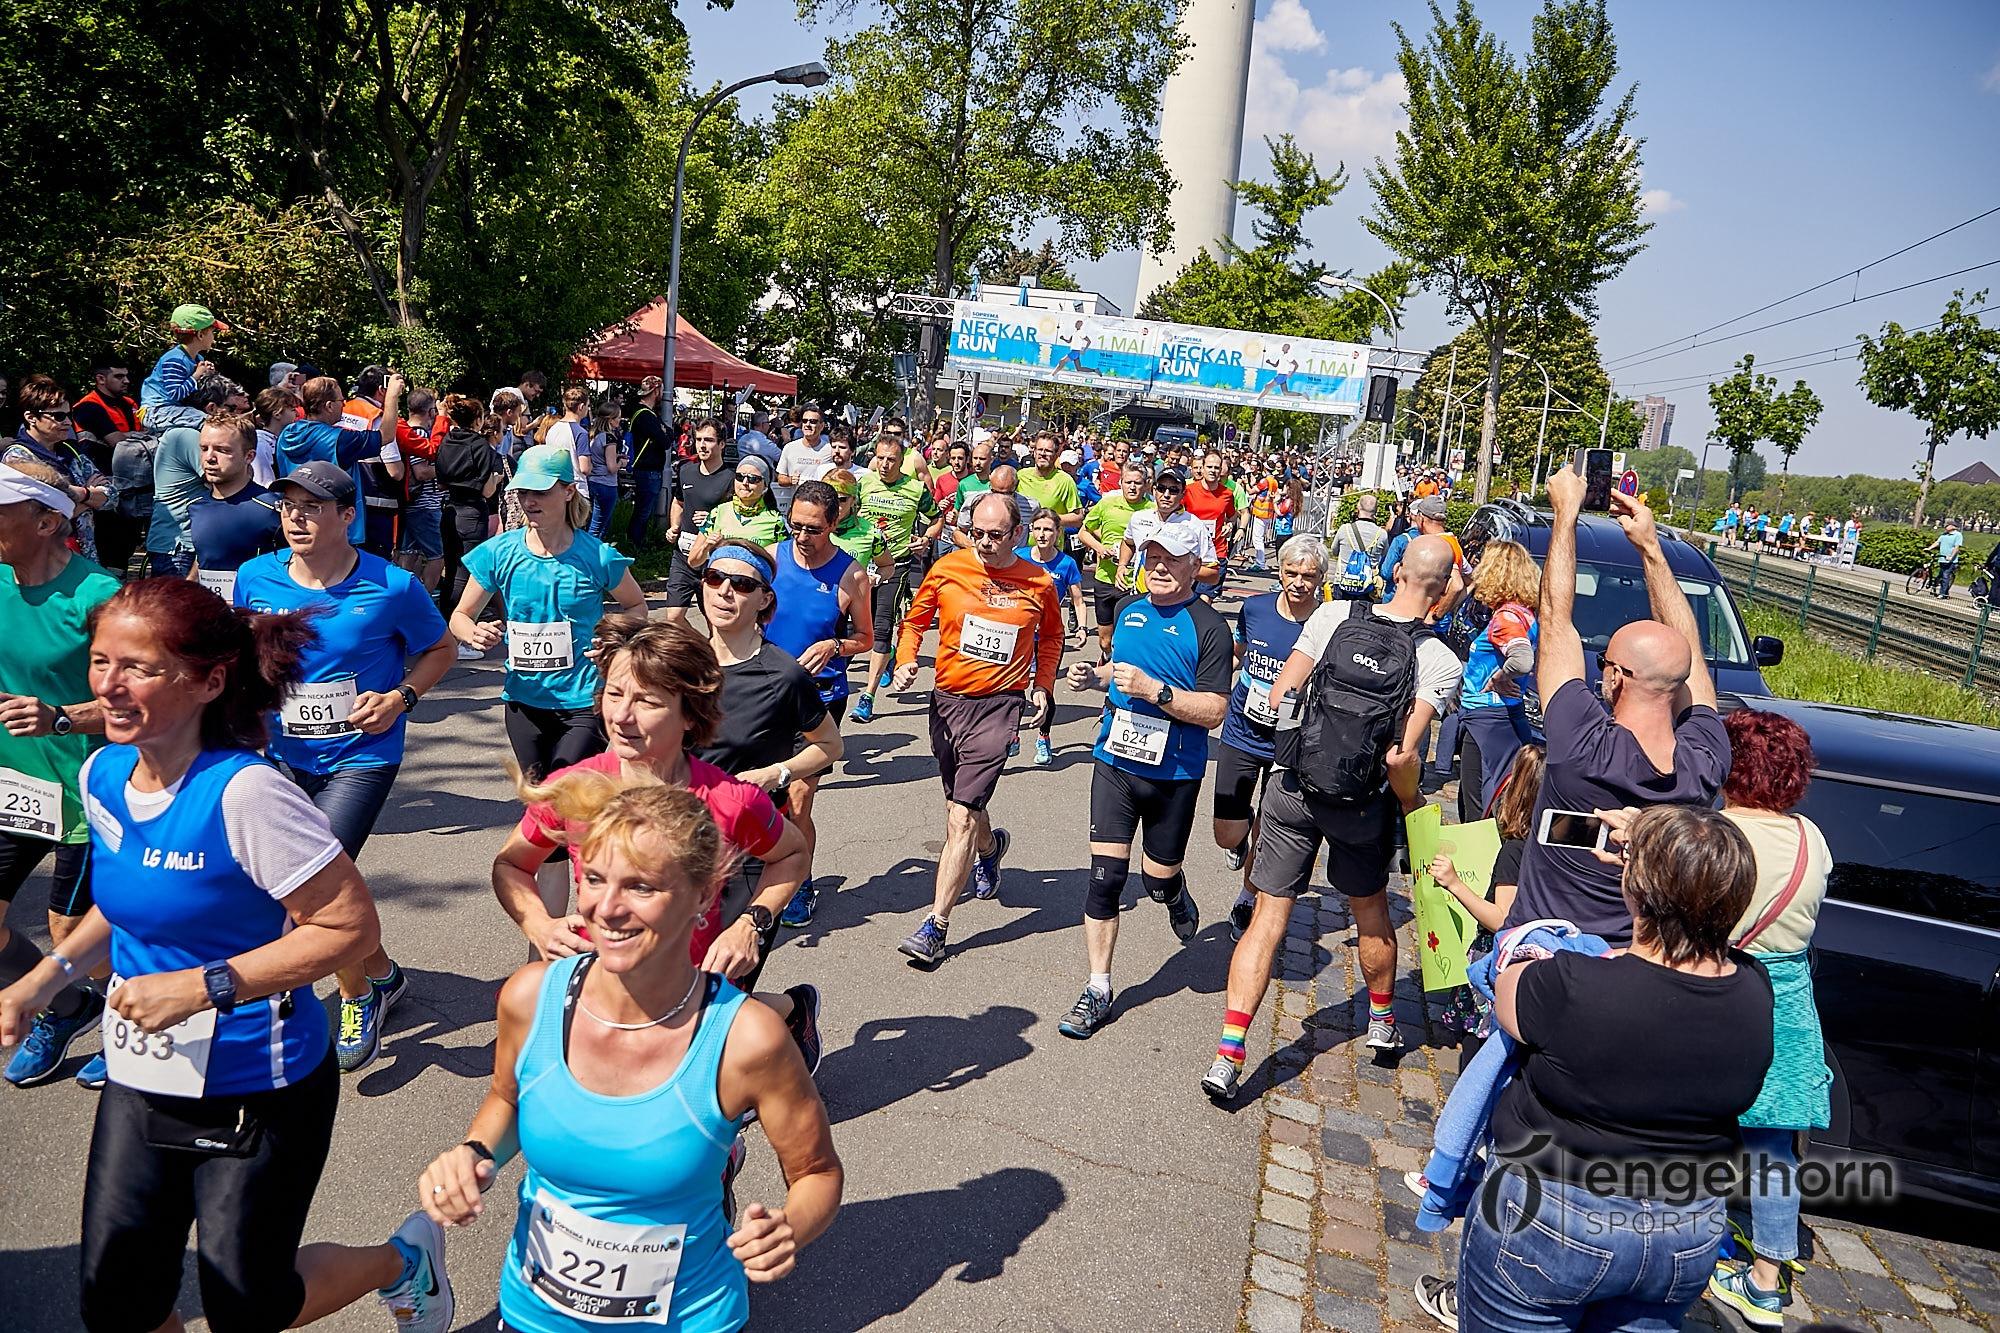 3. SOPREMA Neckar Run